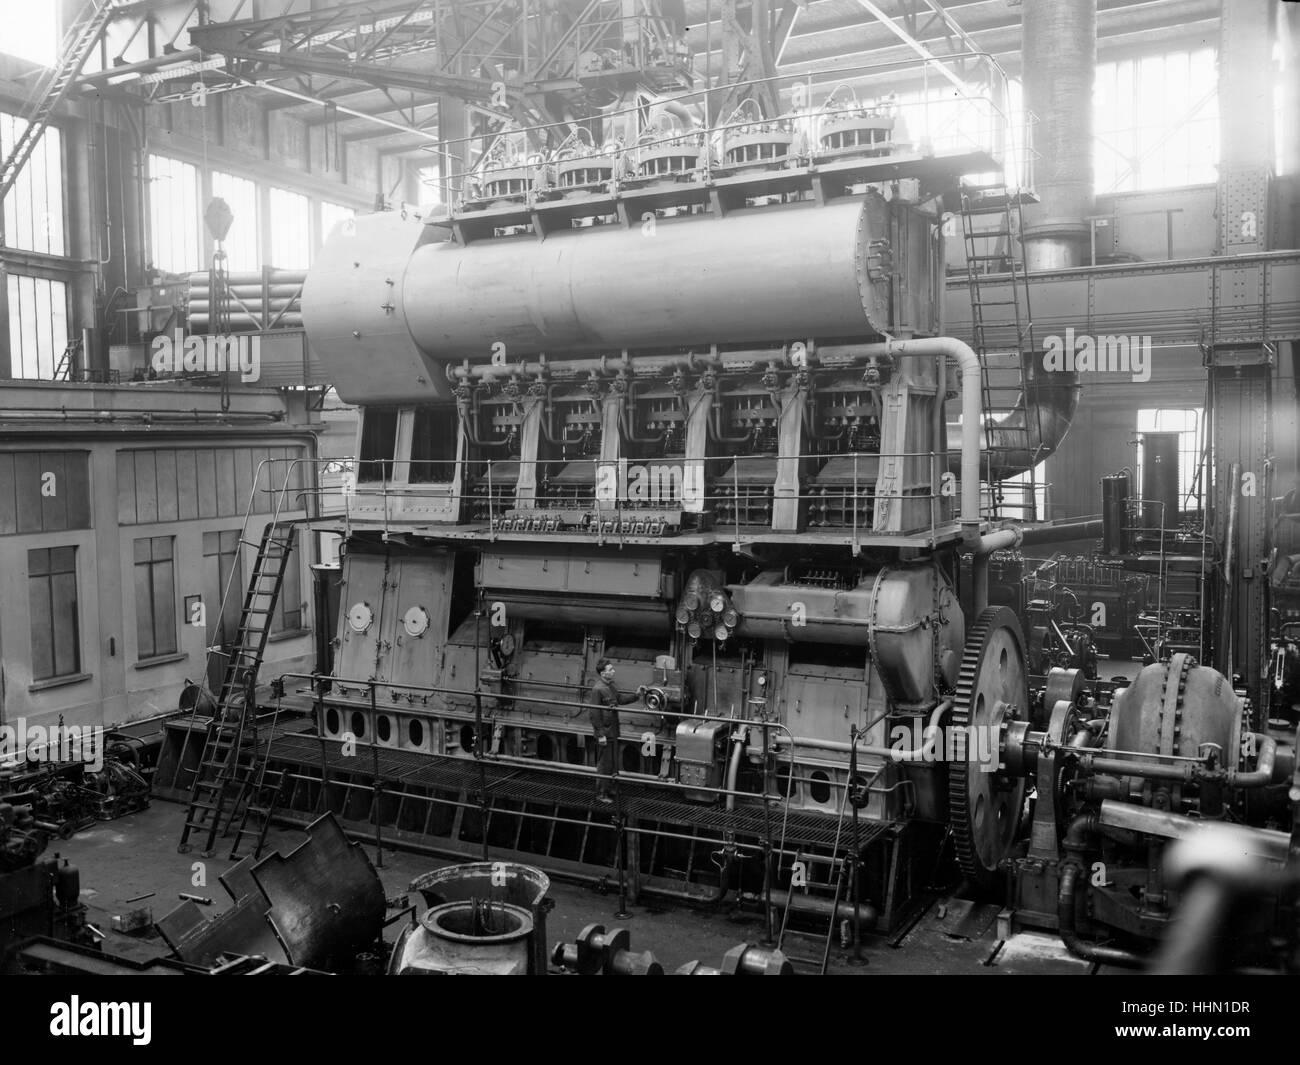 1930 - 40. Fiat - Ansaldo grande fabbrica di motori in Genova San Pier d'Arena, sanpierdarena. Immagini Stock